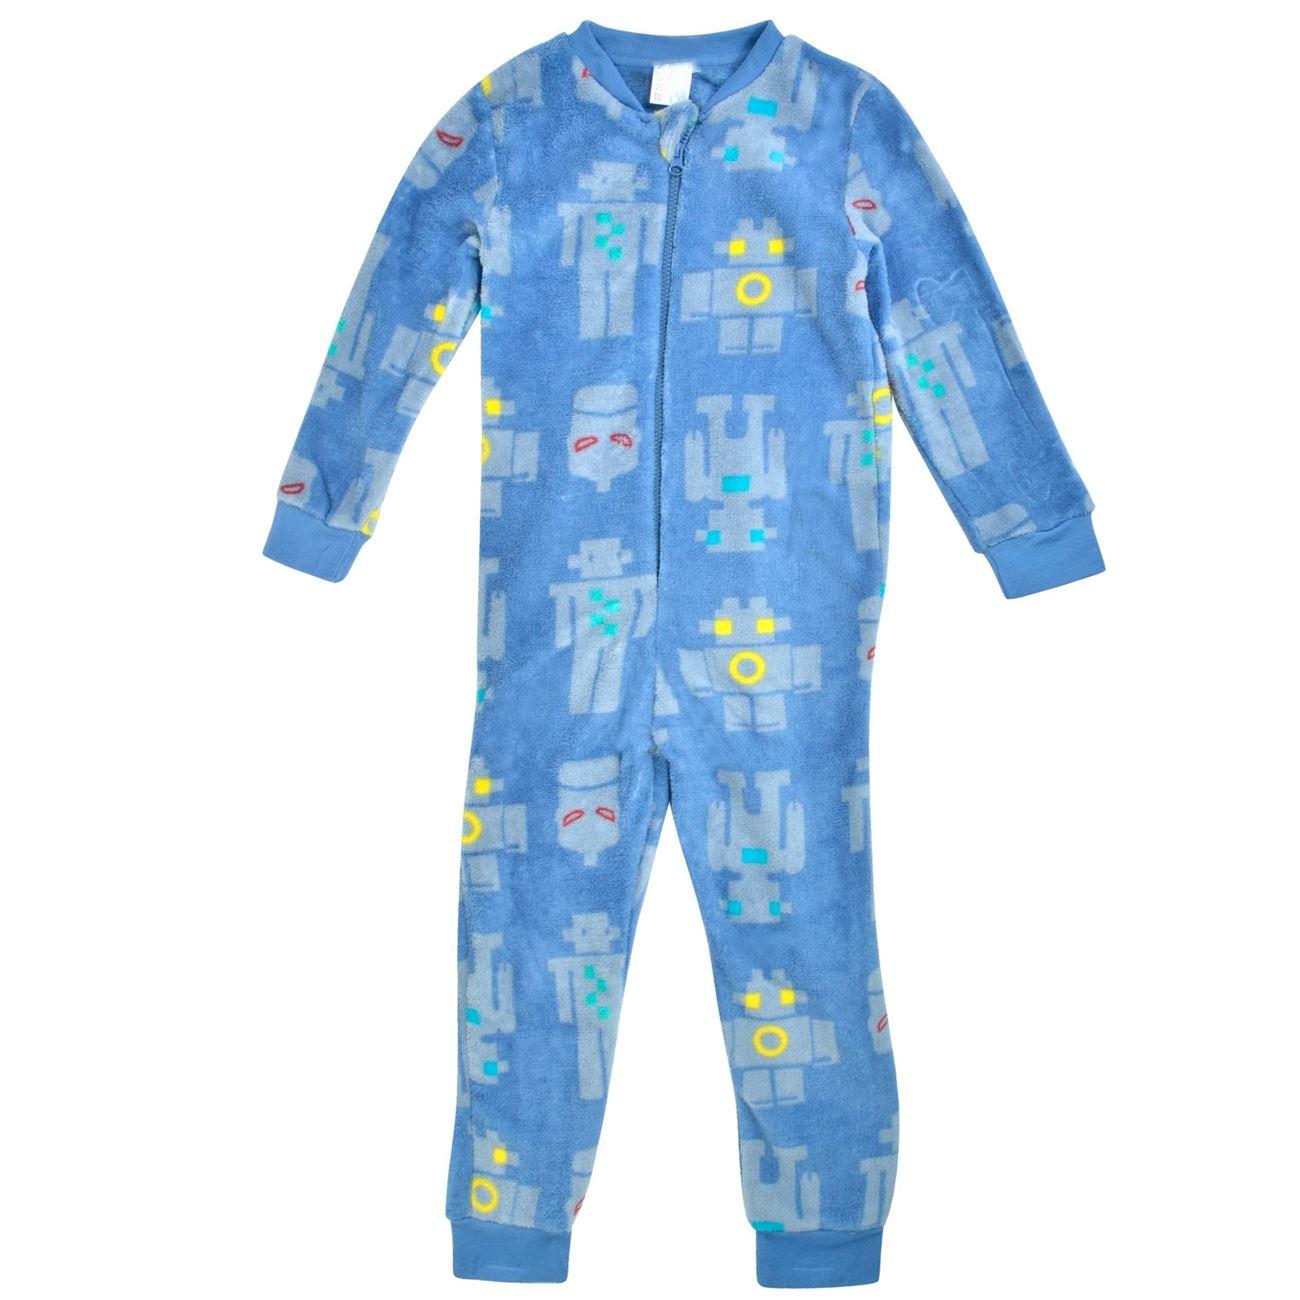 b878a620518 Πυτζάμες Ενηλίκων-Παιδικές < Ρούχα-Αξεσουάρ Ένδυσης | Jumbo